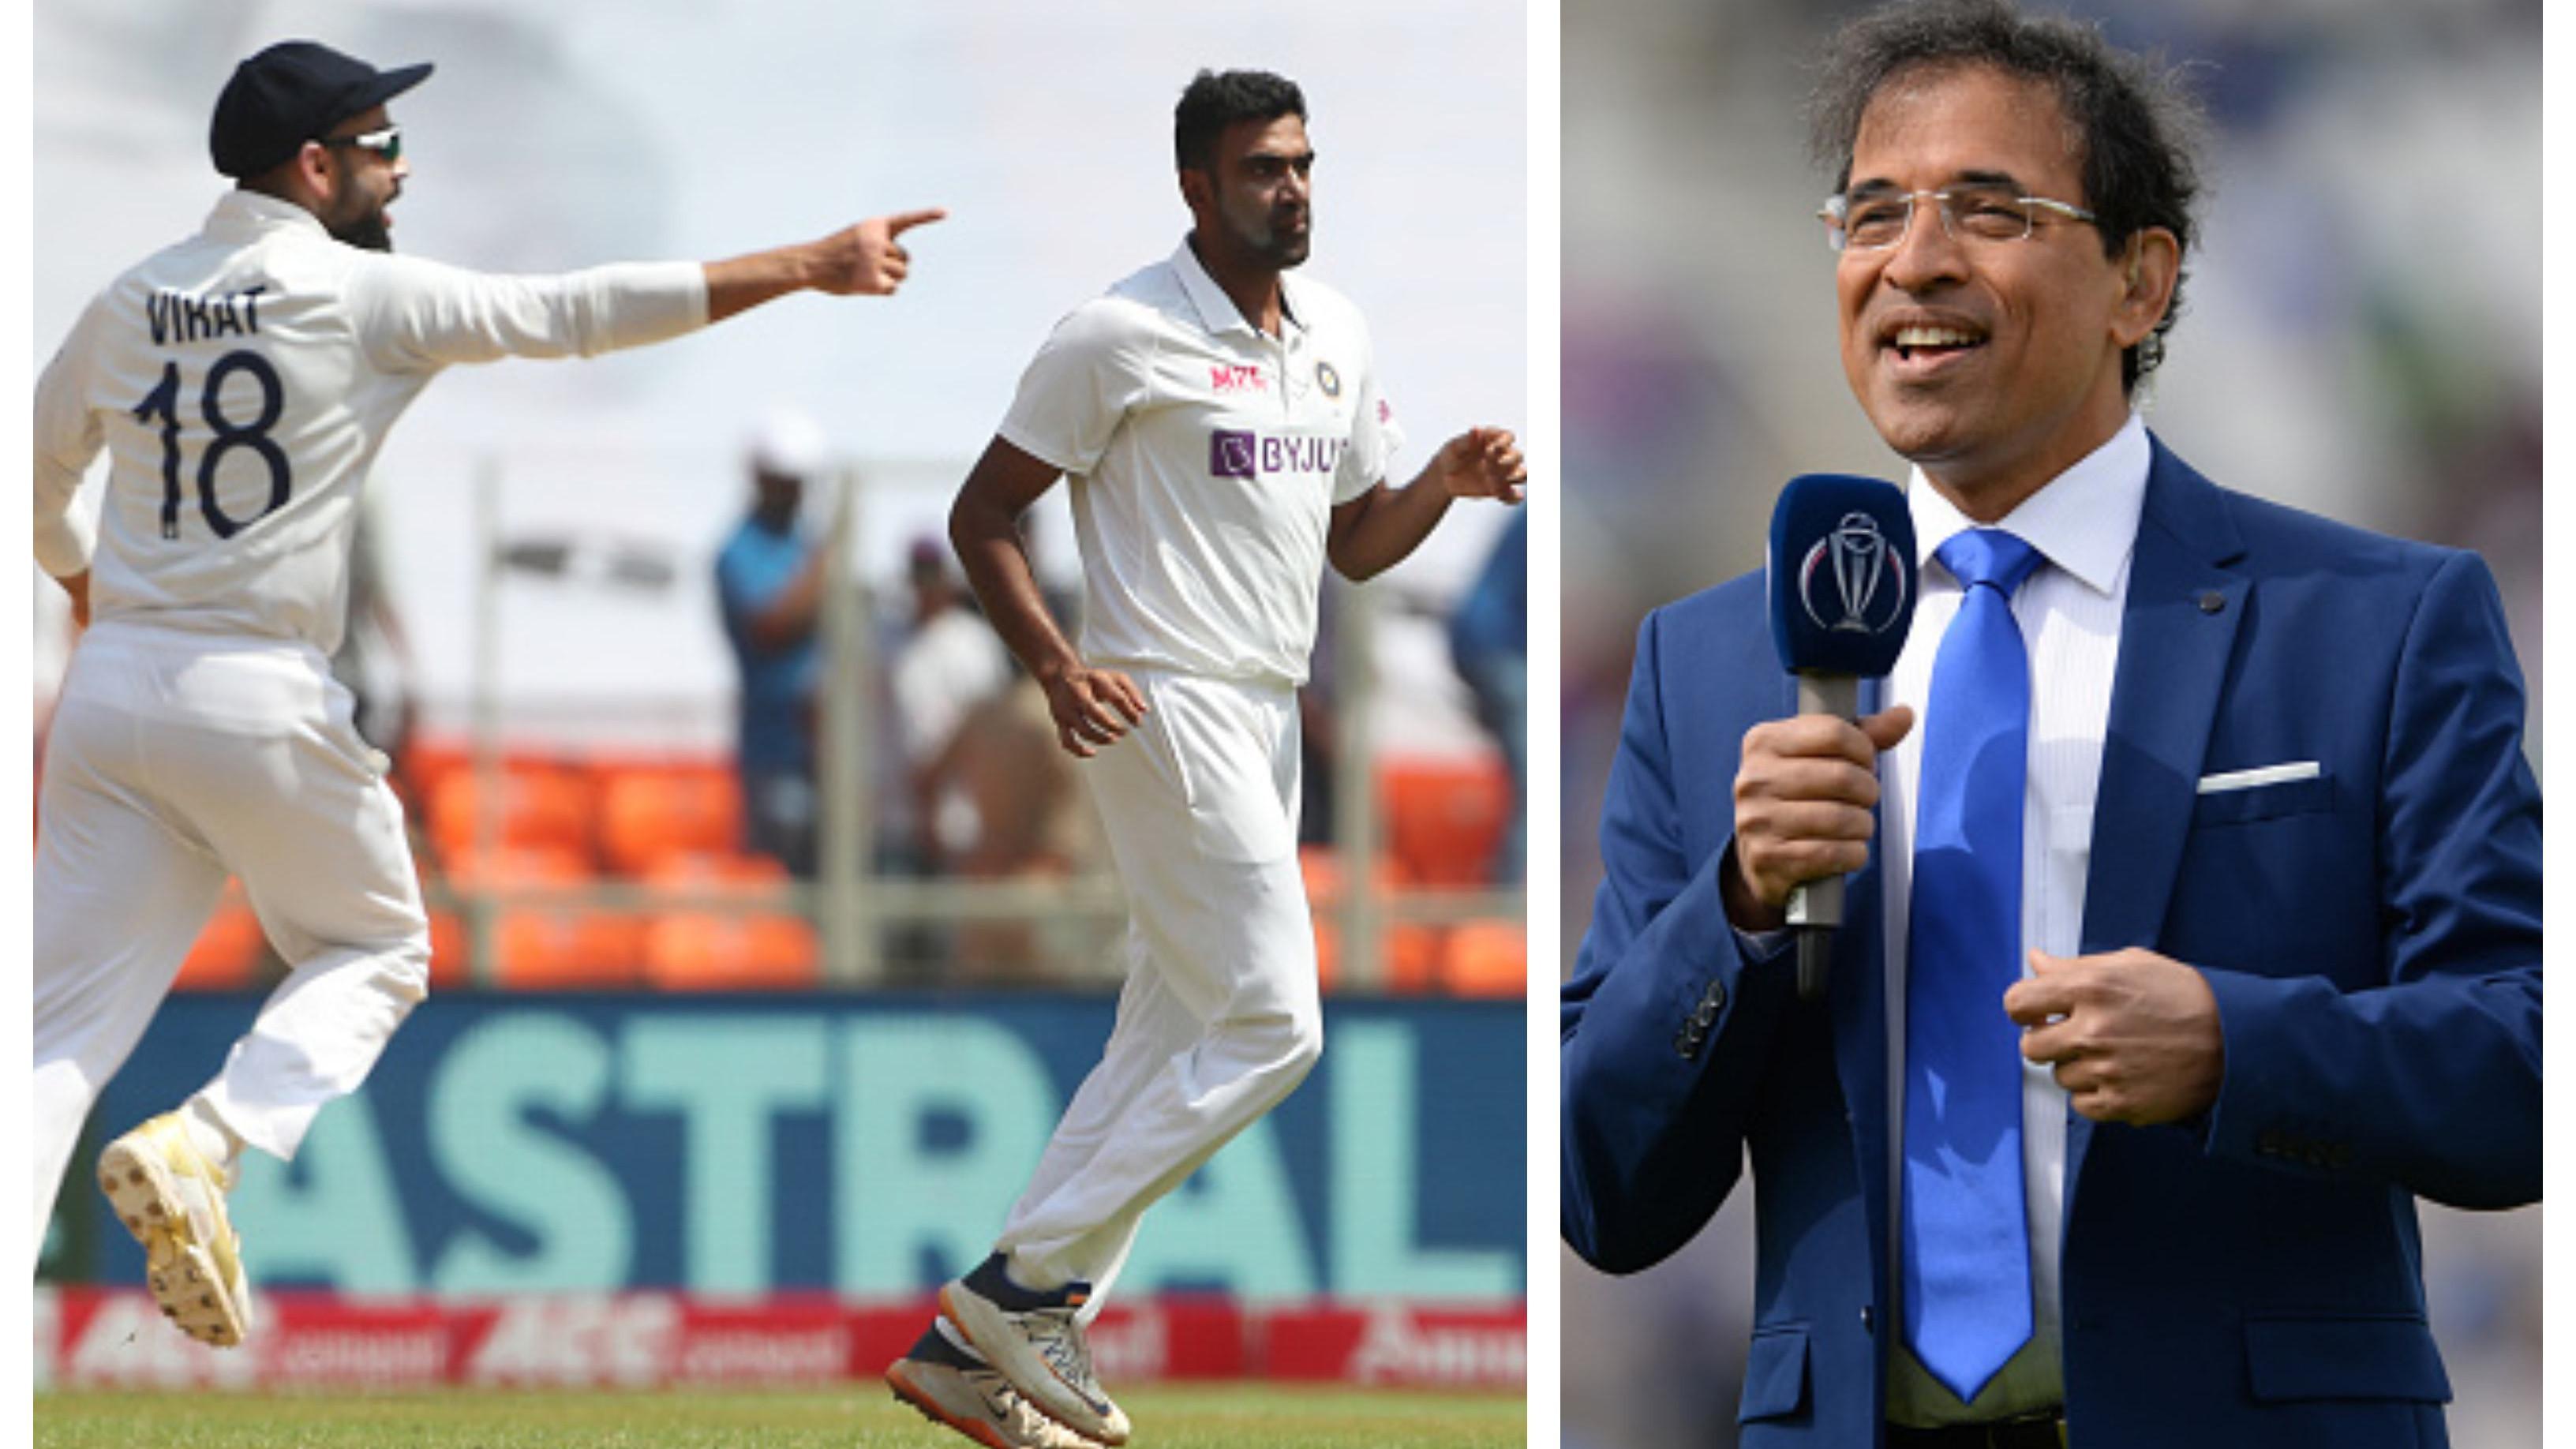 WATCH: Harsha Bhogle picks all-time India Test XI on his 60th birthday; Kohli, Ashwin make the cut from current team